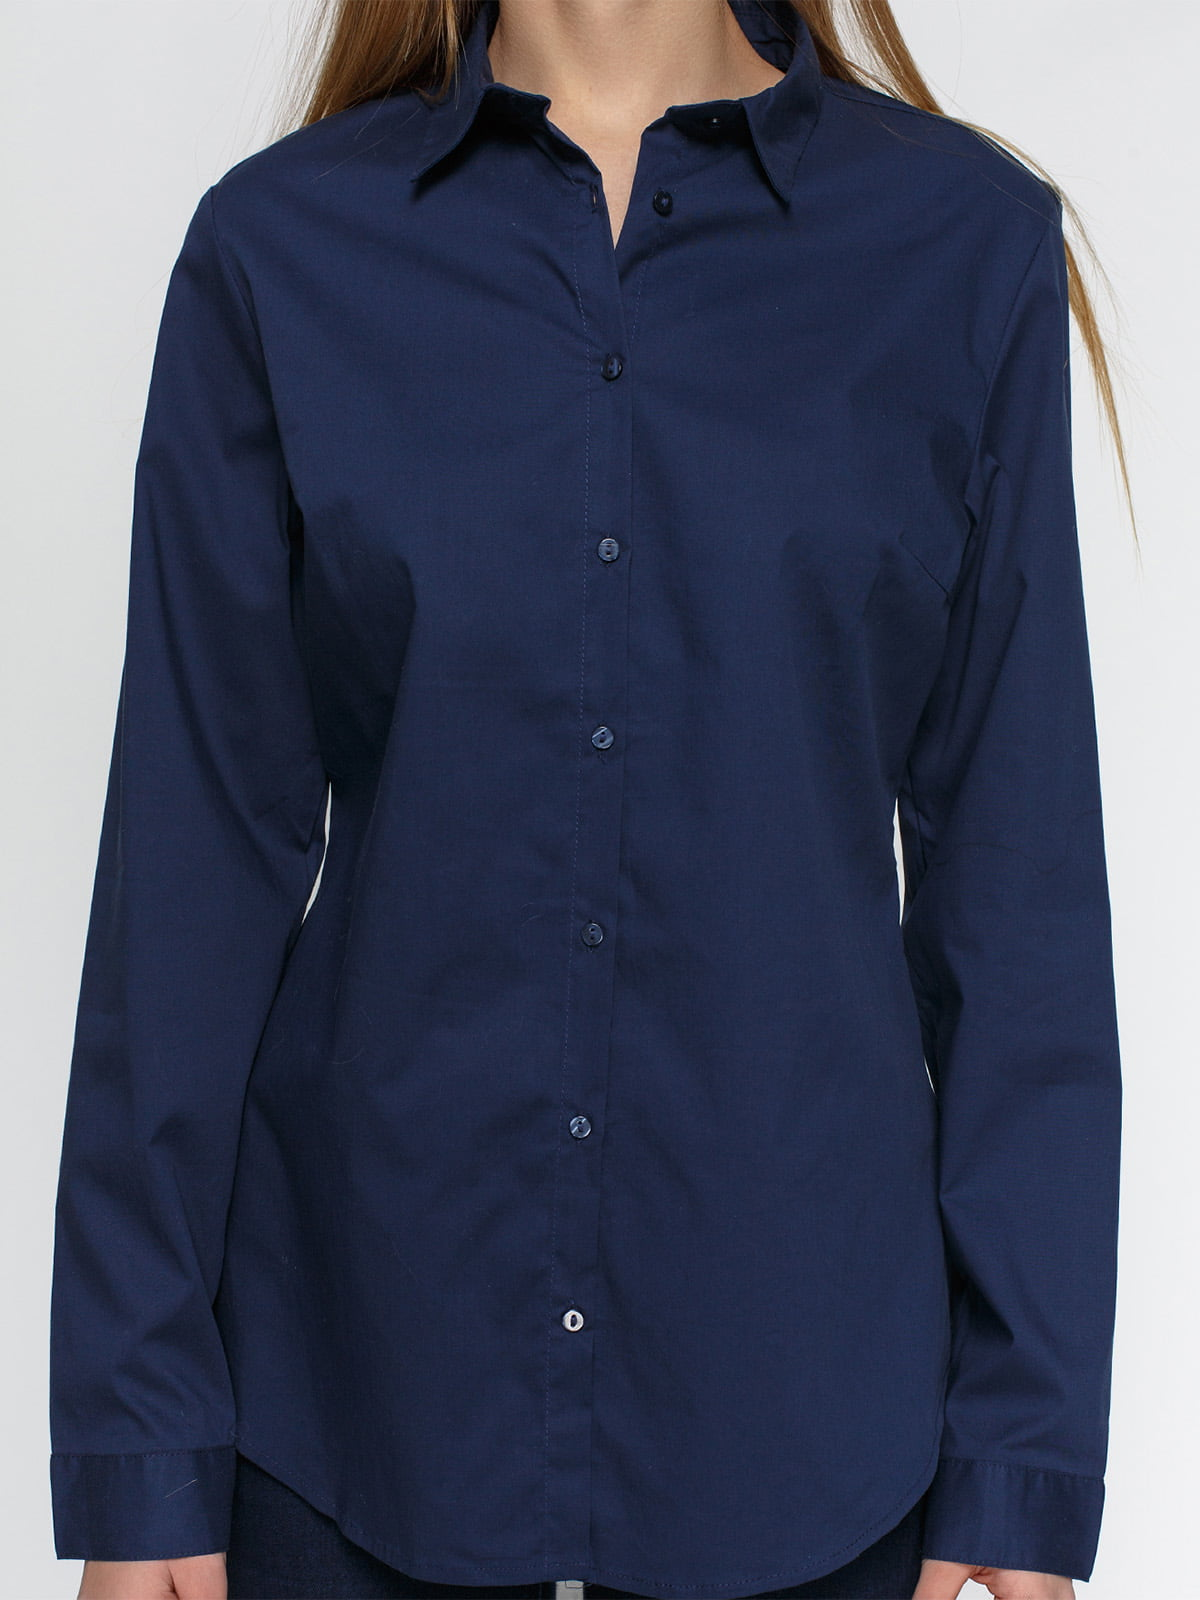 Рубашка синяя   4546609   фото 3